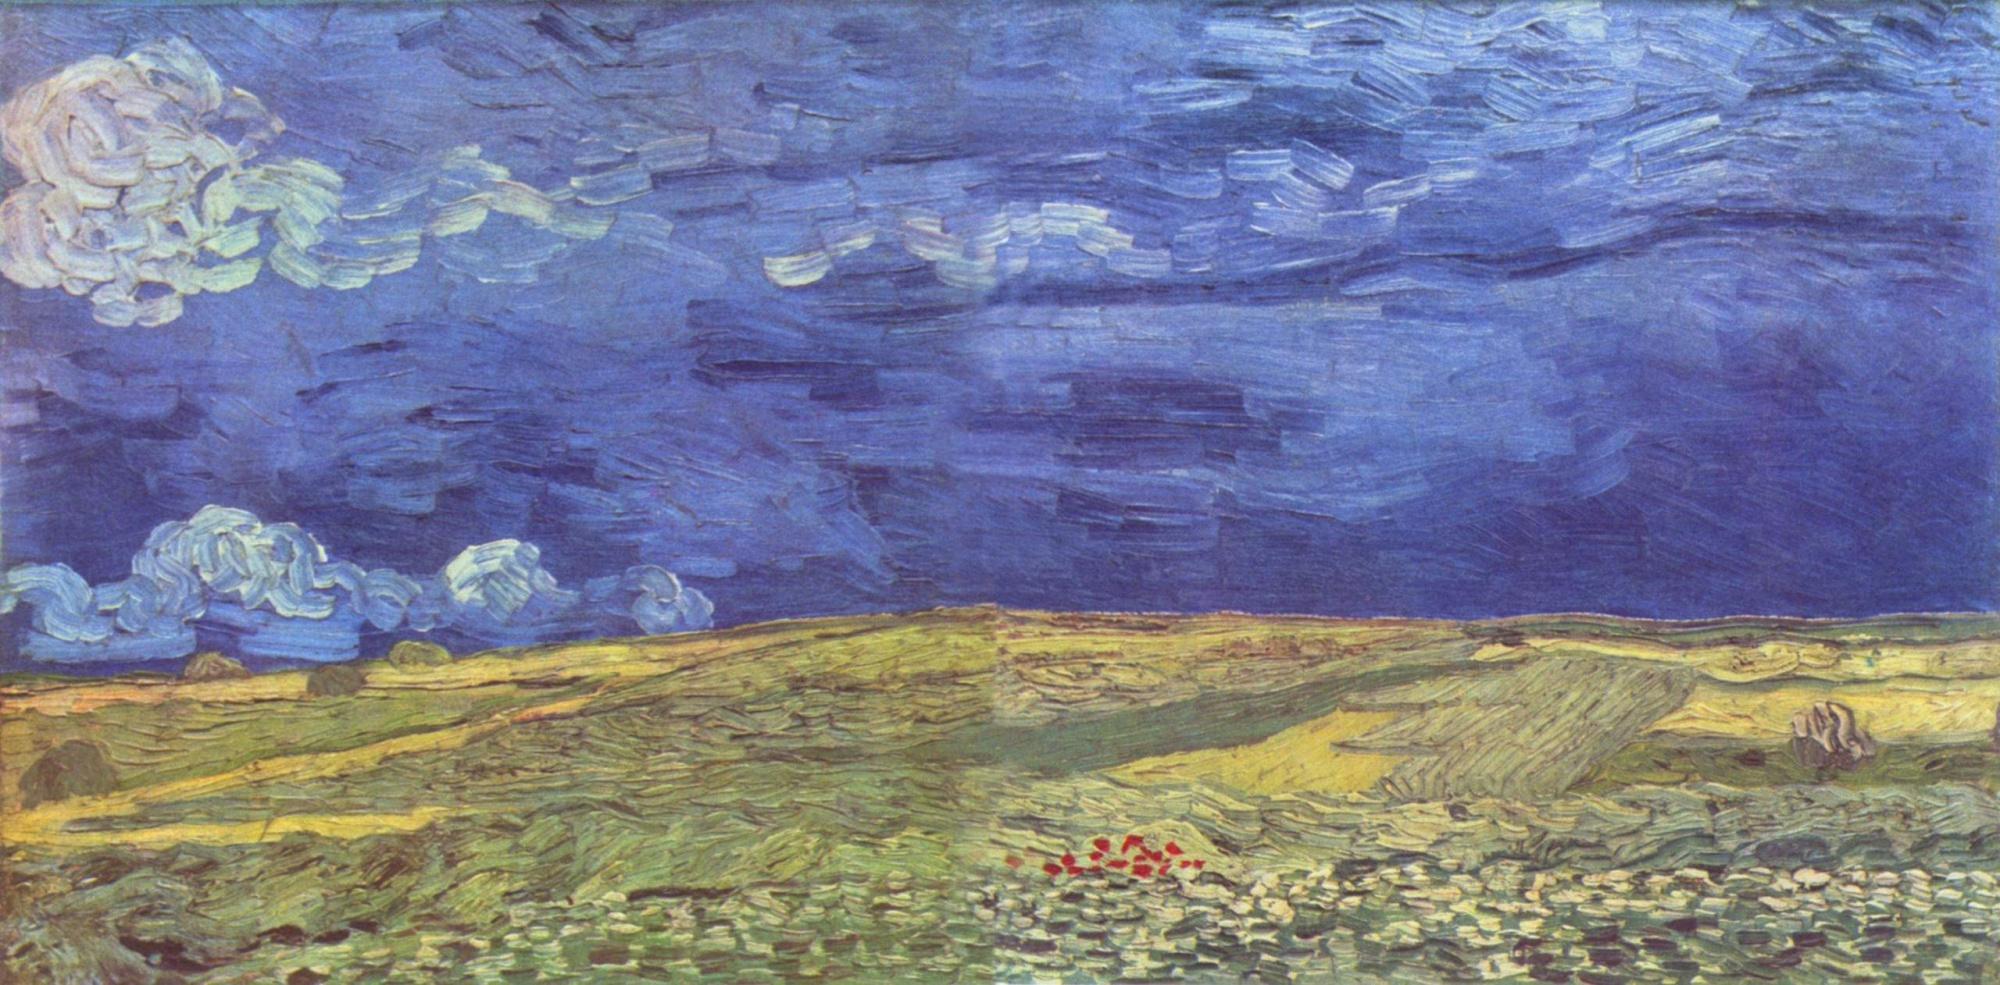 картина < Поле под грозовым небом > :: Ван Гог - Van Gogh (Ван Гог) фото